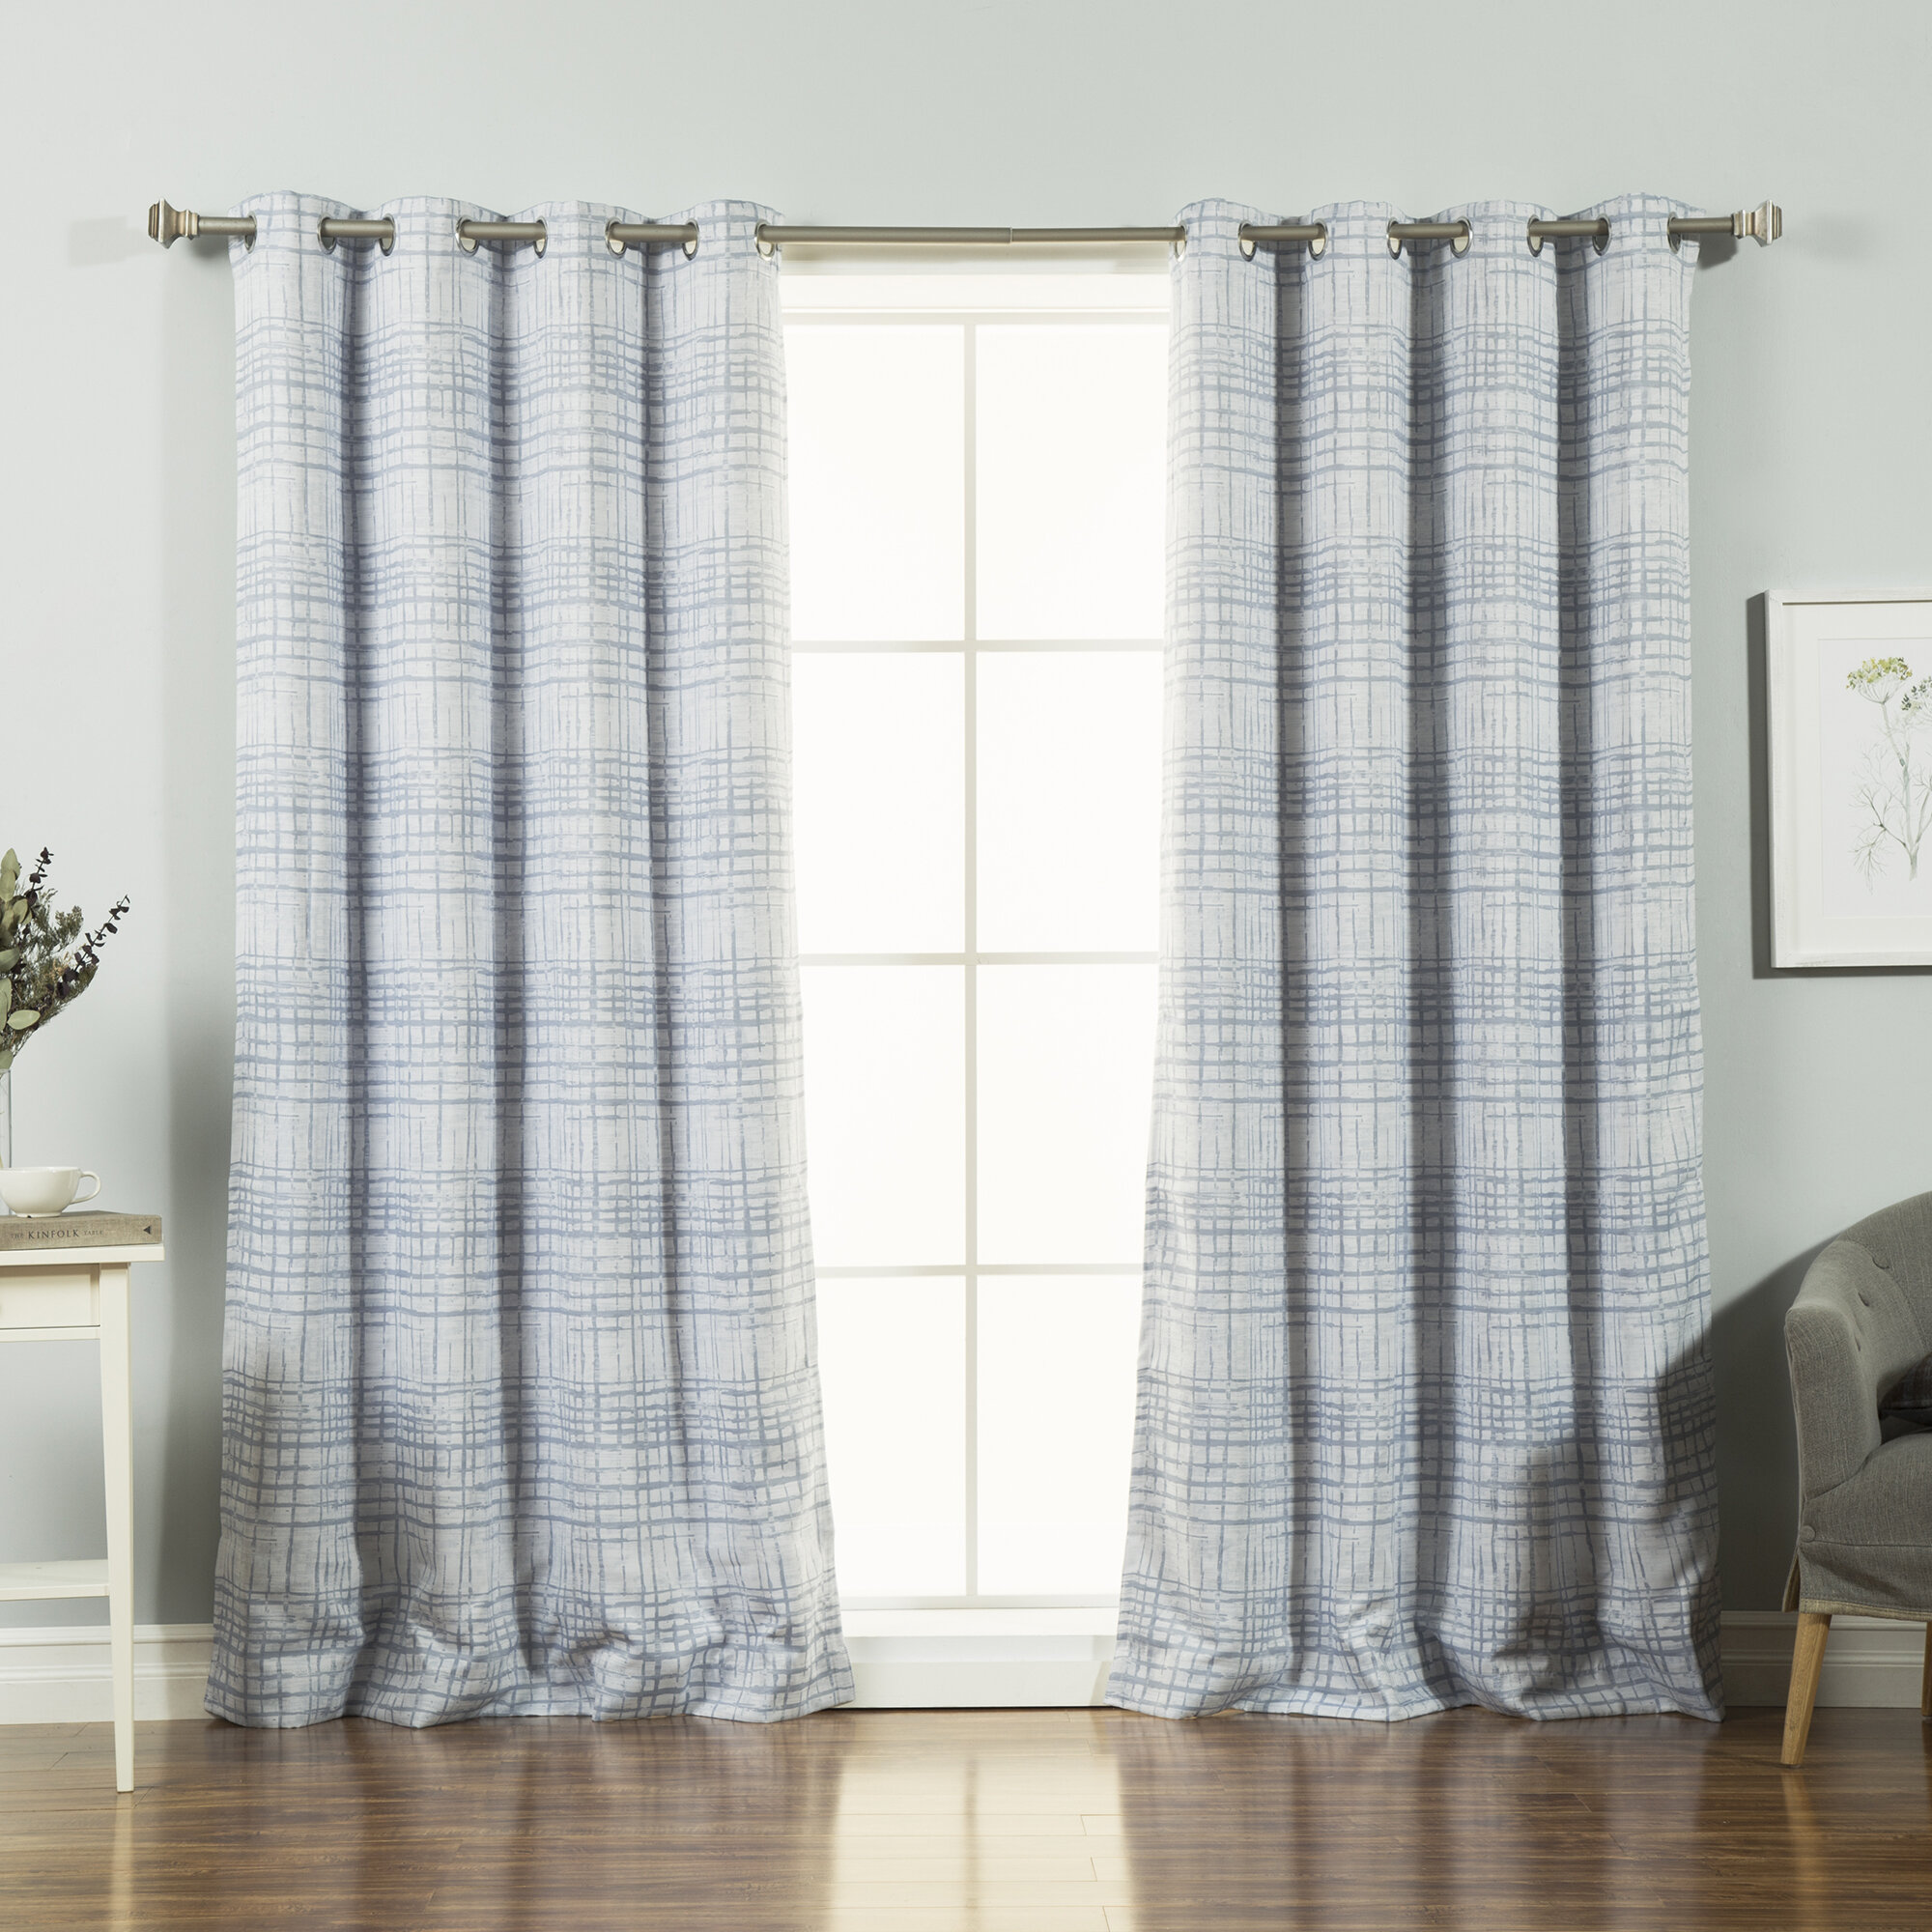 ca panel home room darkening pdp single curtain window damask drapes baroque danseng treatments wayfair grey with grommets dansenghome grommet drapery reviews